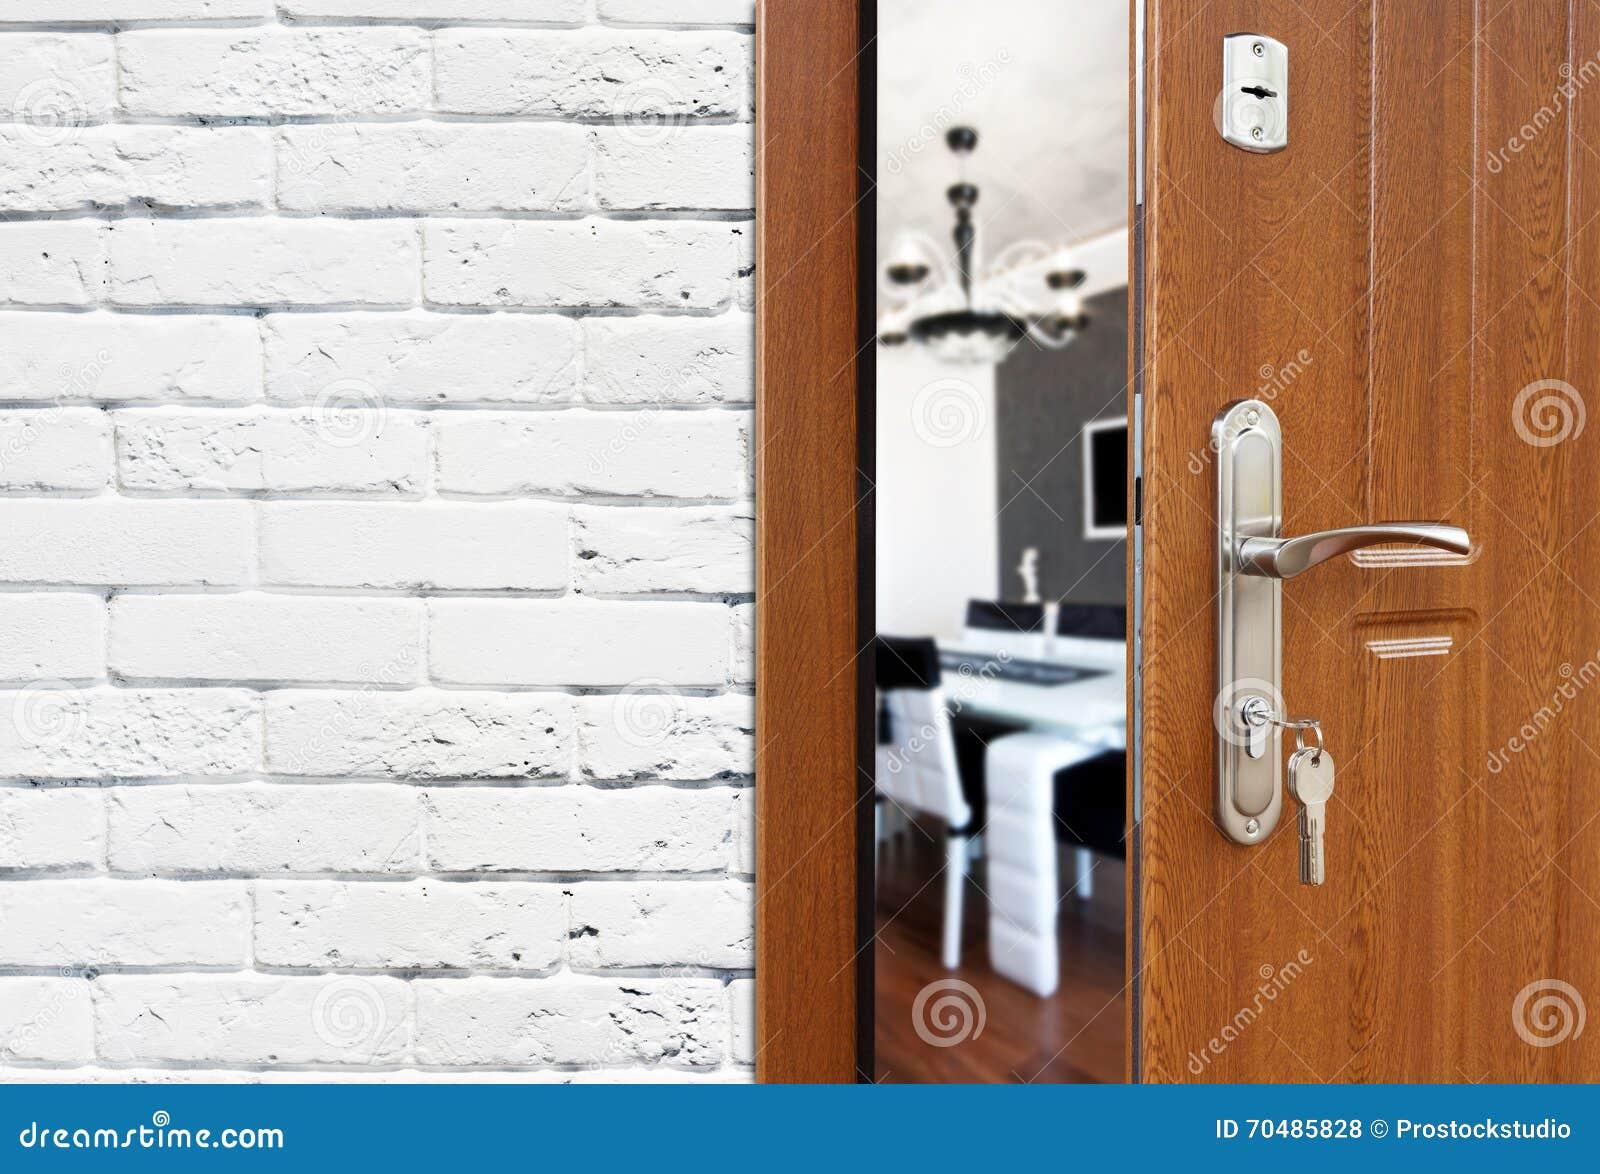 Half Open Door Of A Modern Kitchen Closeup. Stock Photo - Image of ...